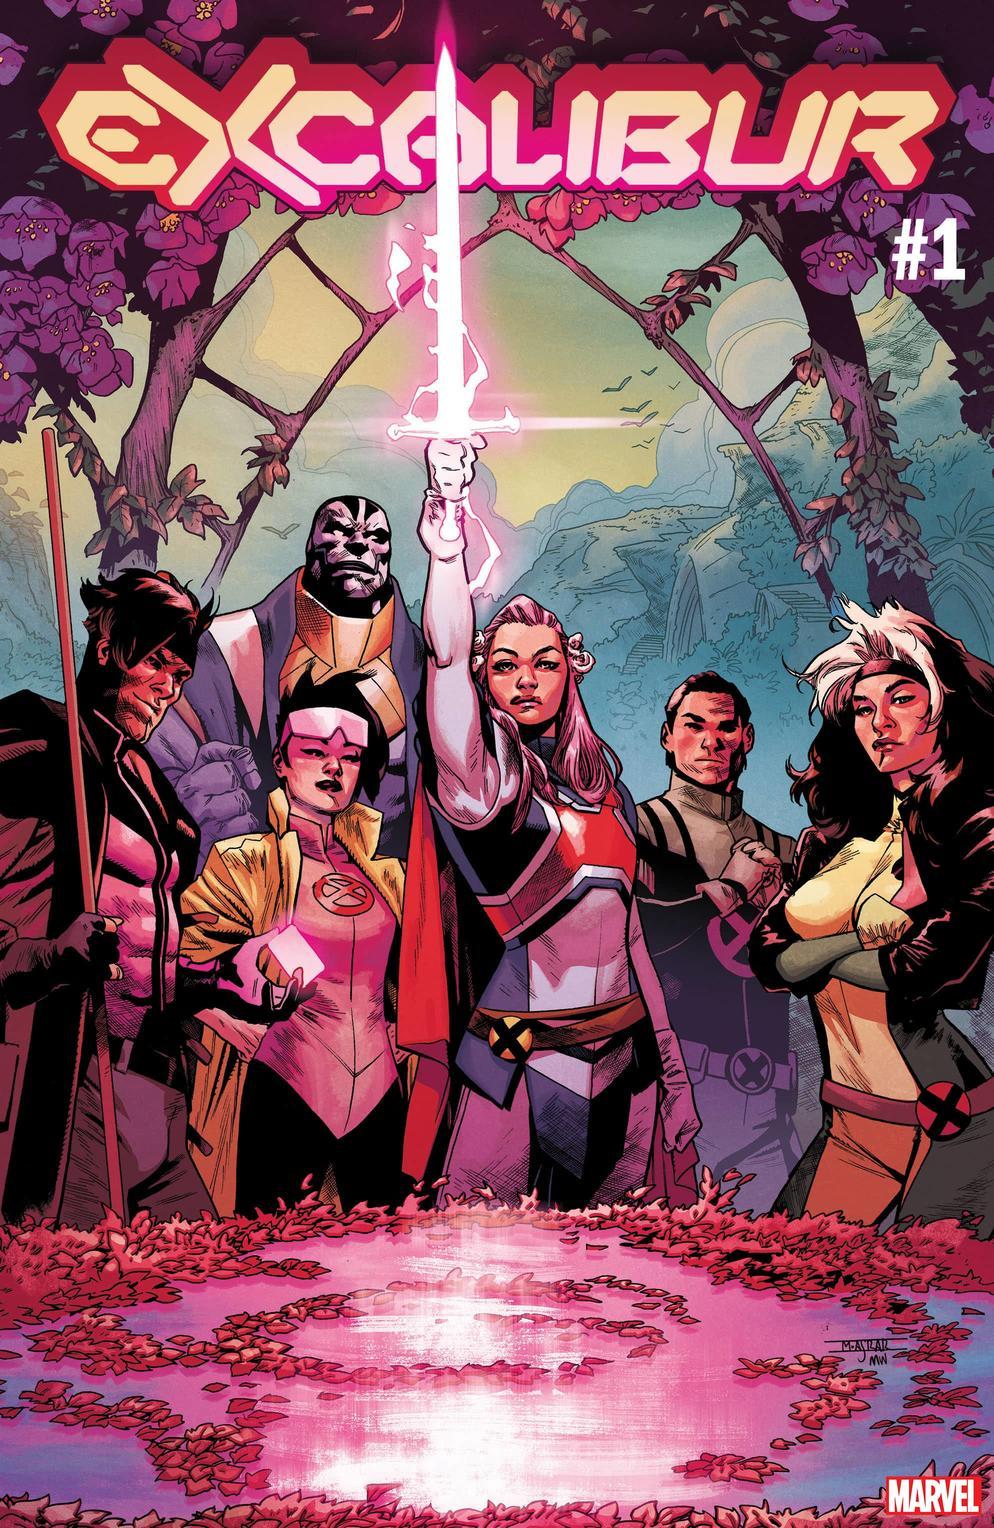 Marvel Comics na SDCC 2019 - X-Men - Excalibur #1 - Blog Farofeiros